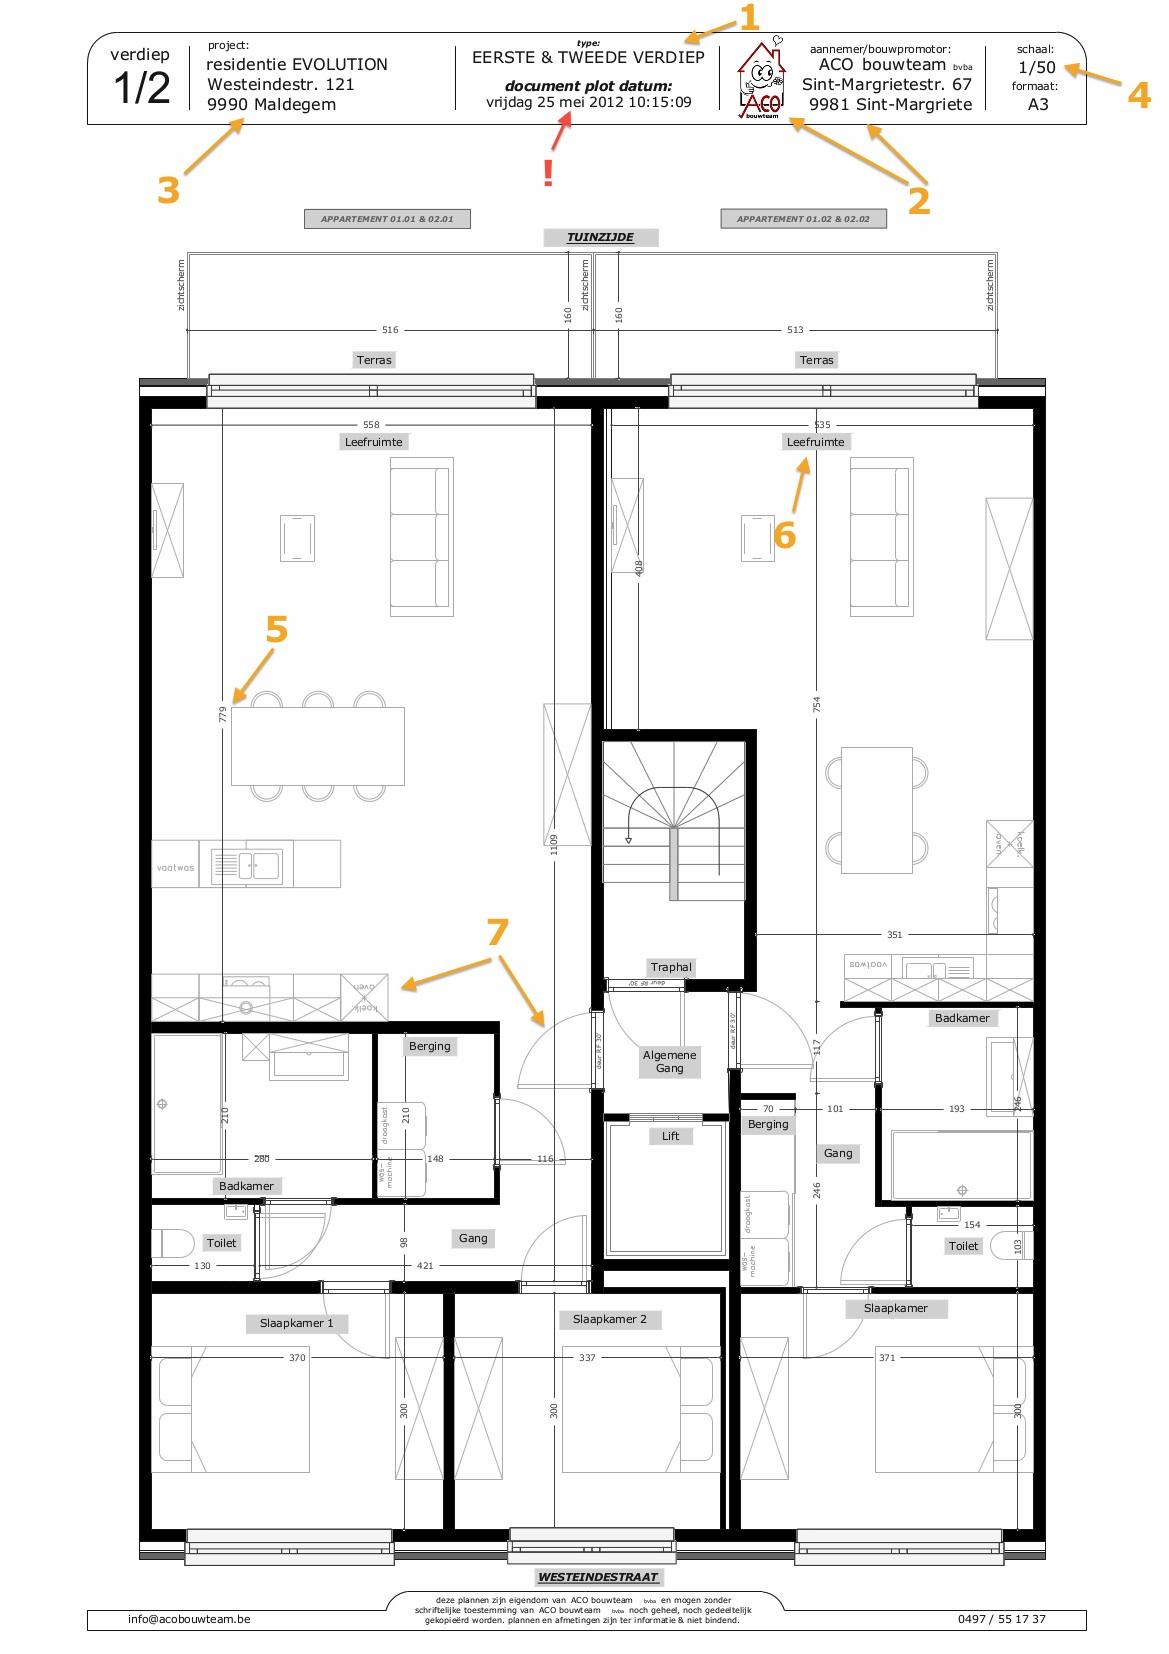 autocad 2016 house plan tutorial